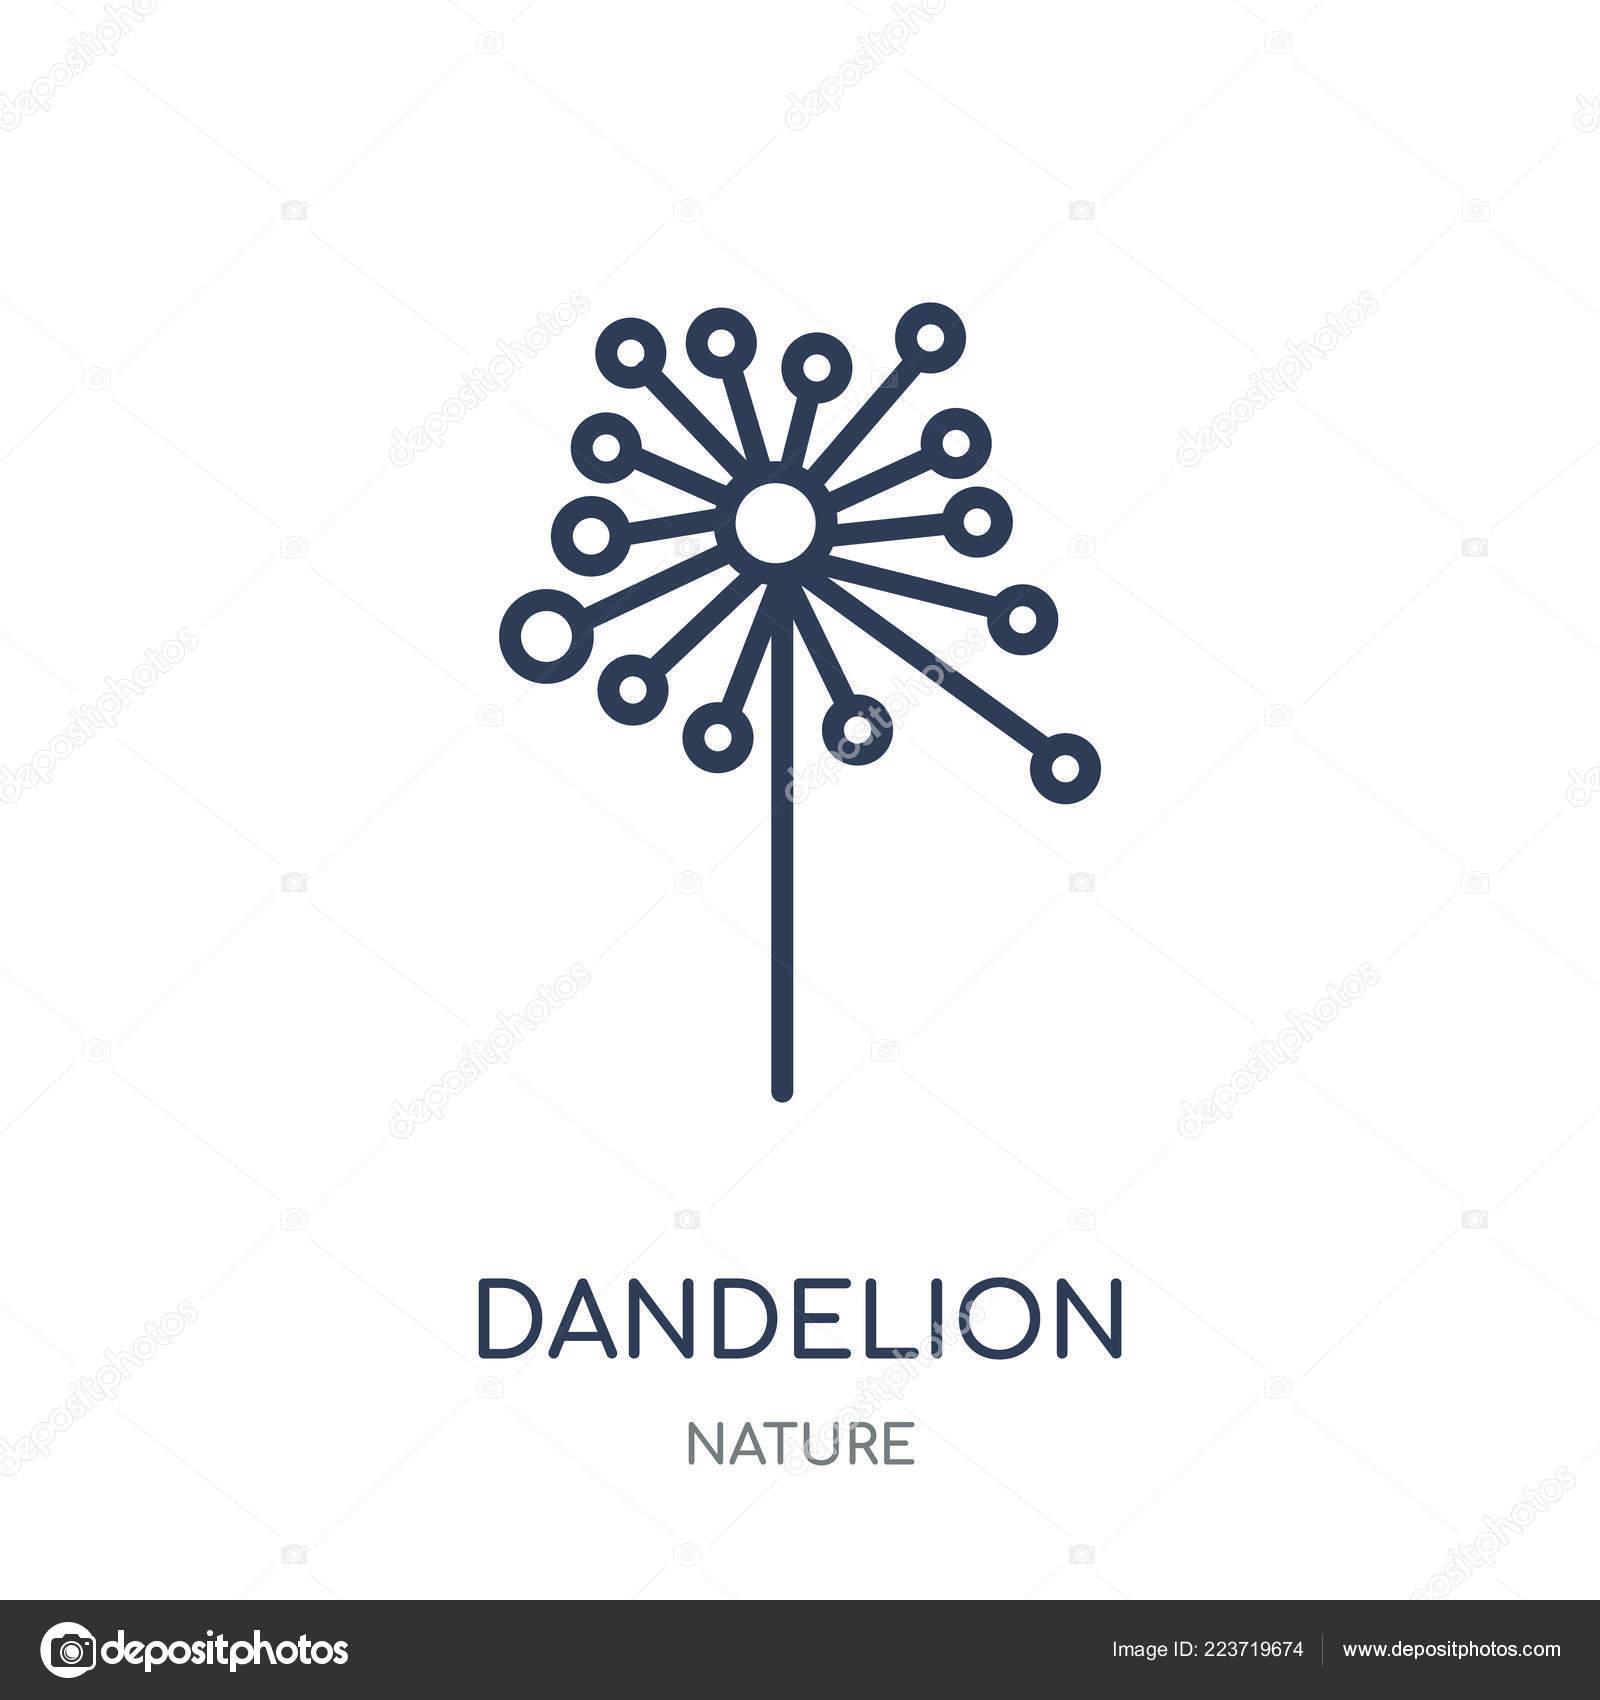 Dandelion Icon Dandelion Linear Symbol Design Nature Collection